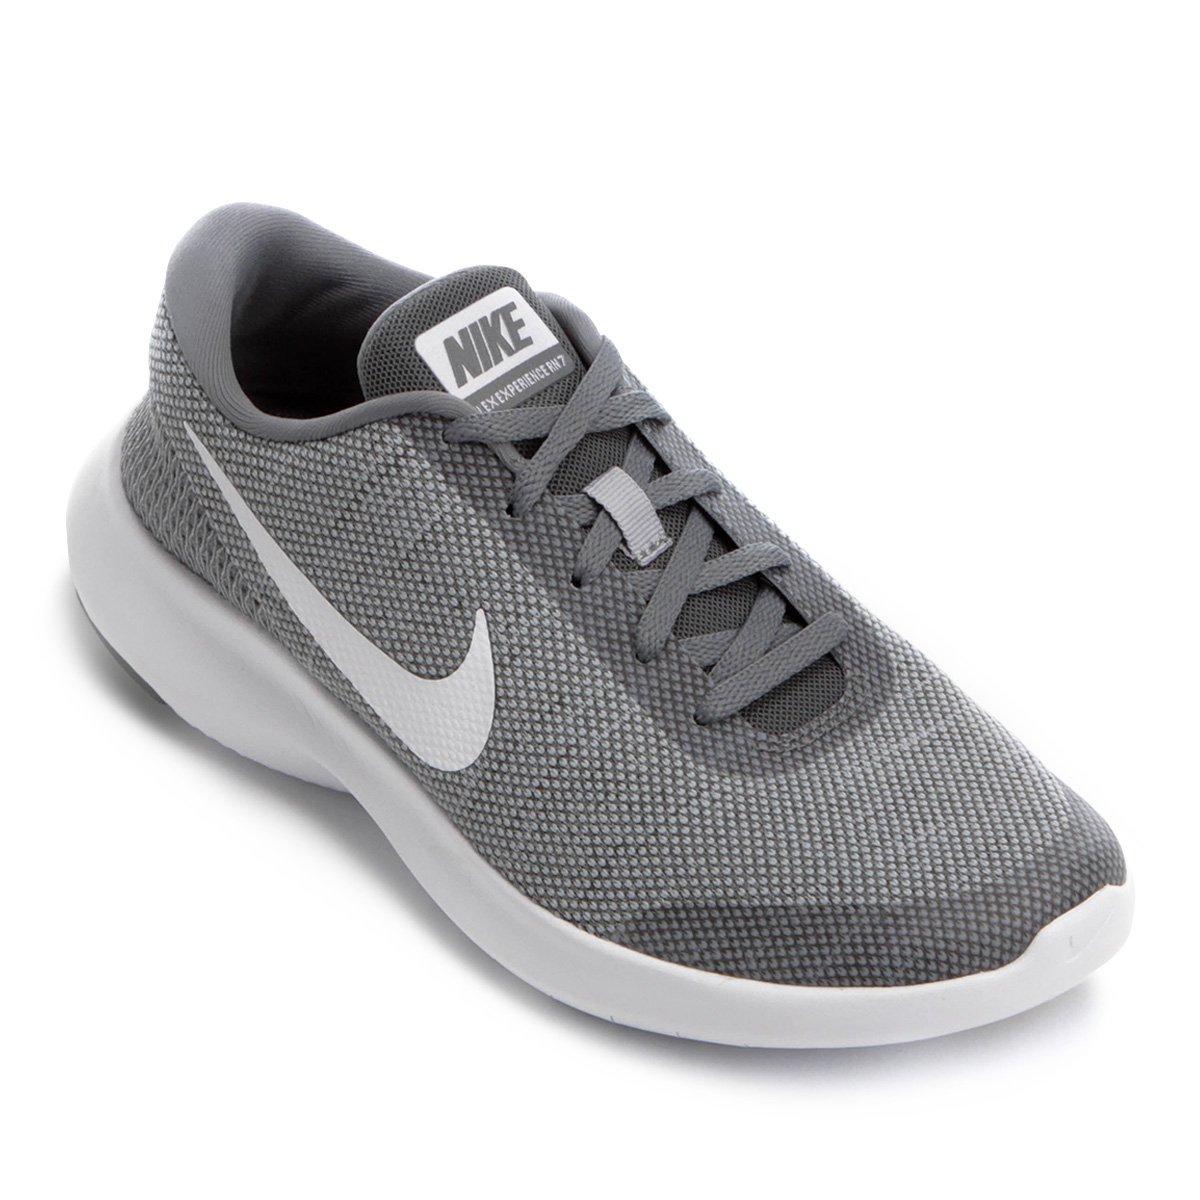 Tênis Nike Flex Experience Rn 7 Feminino Cinza E Branco